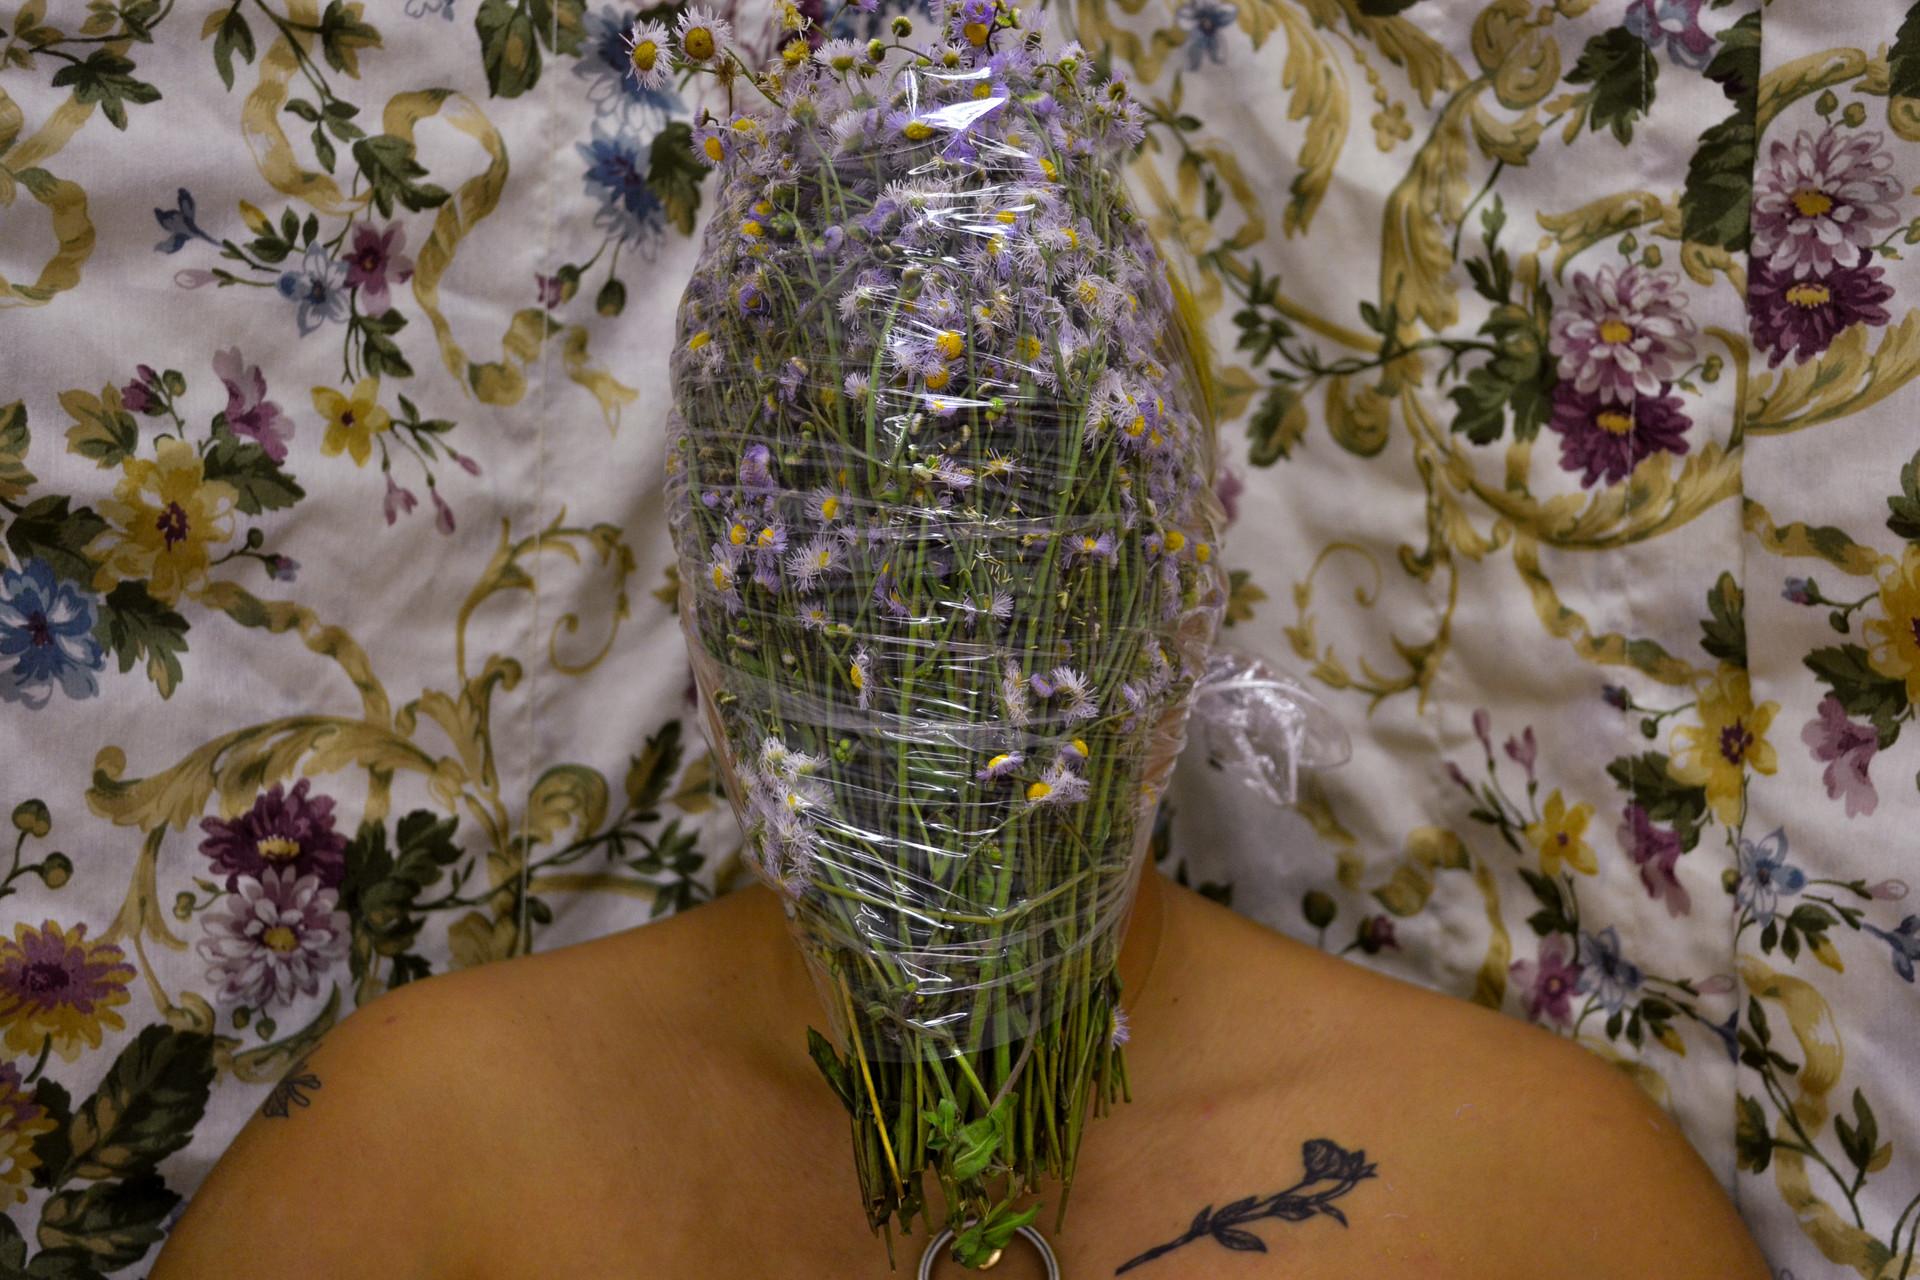 Asphyxia 2, Flowers, Plastic, 2019